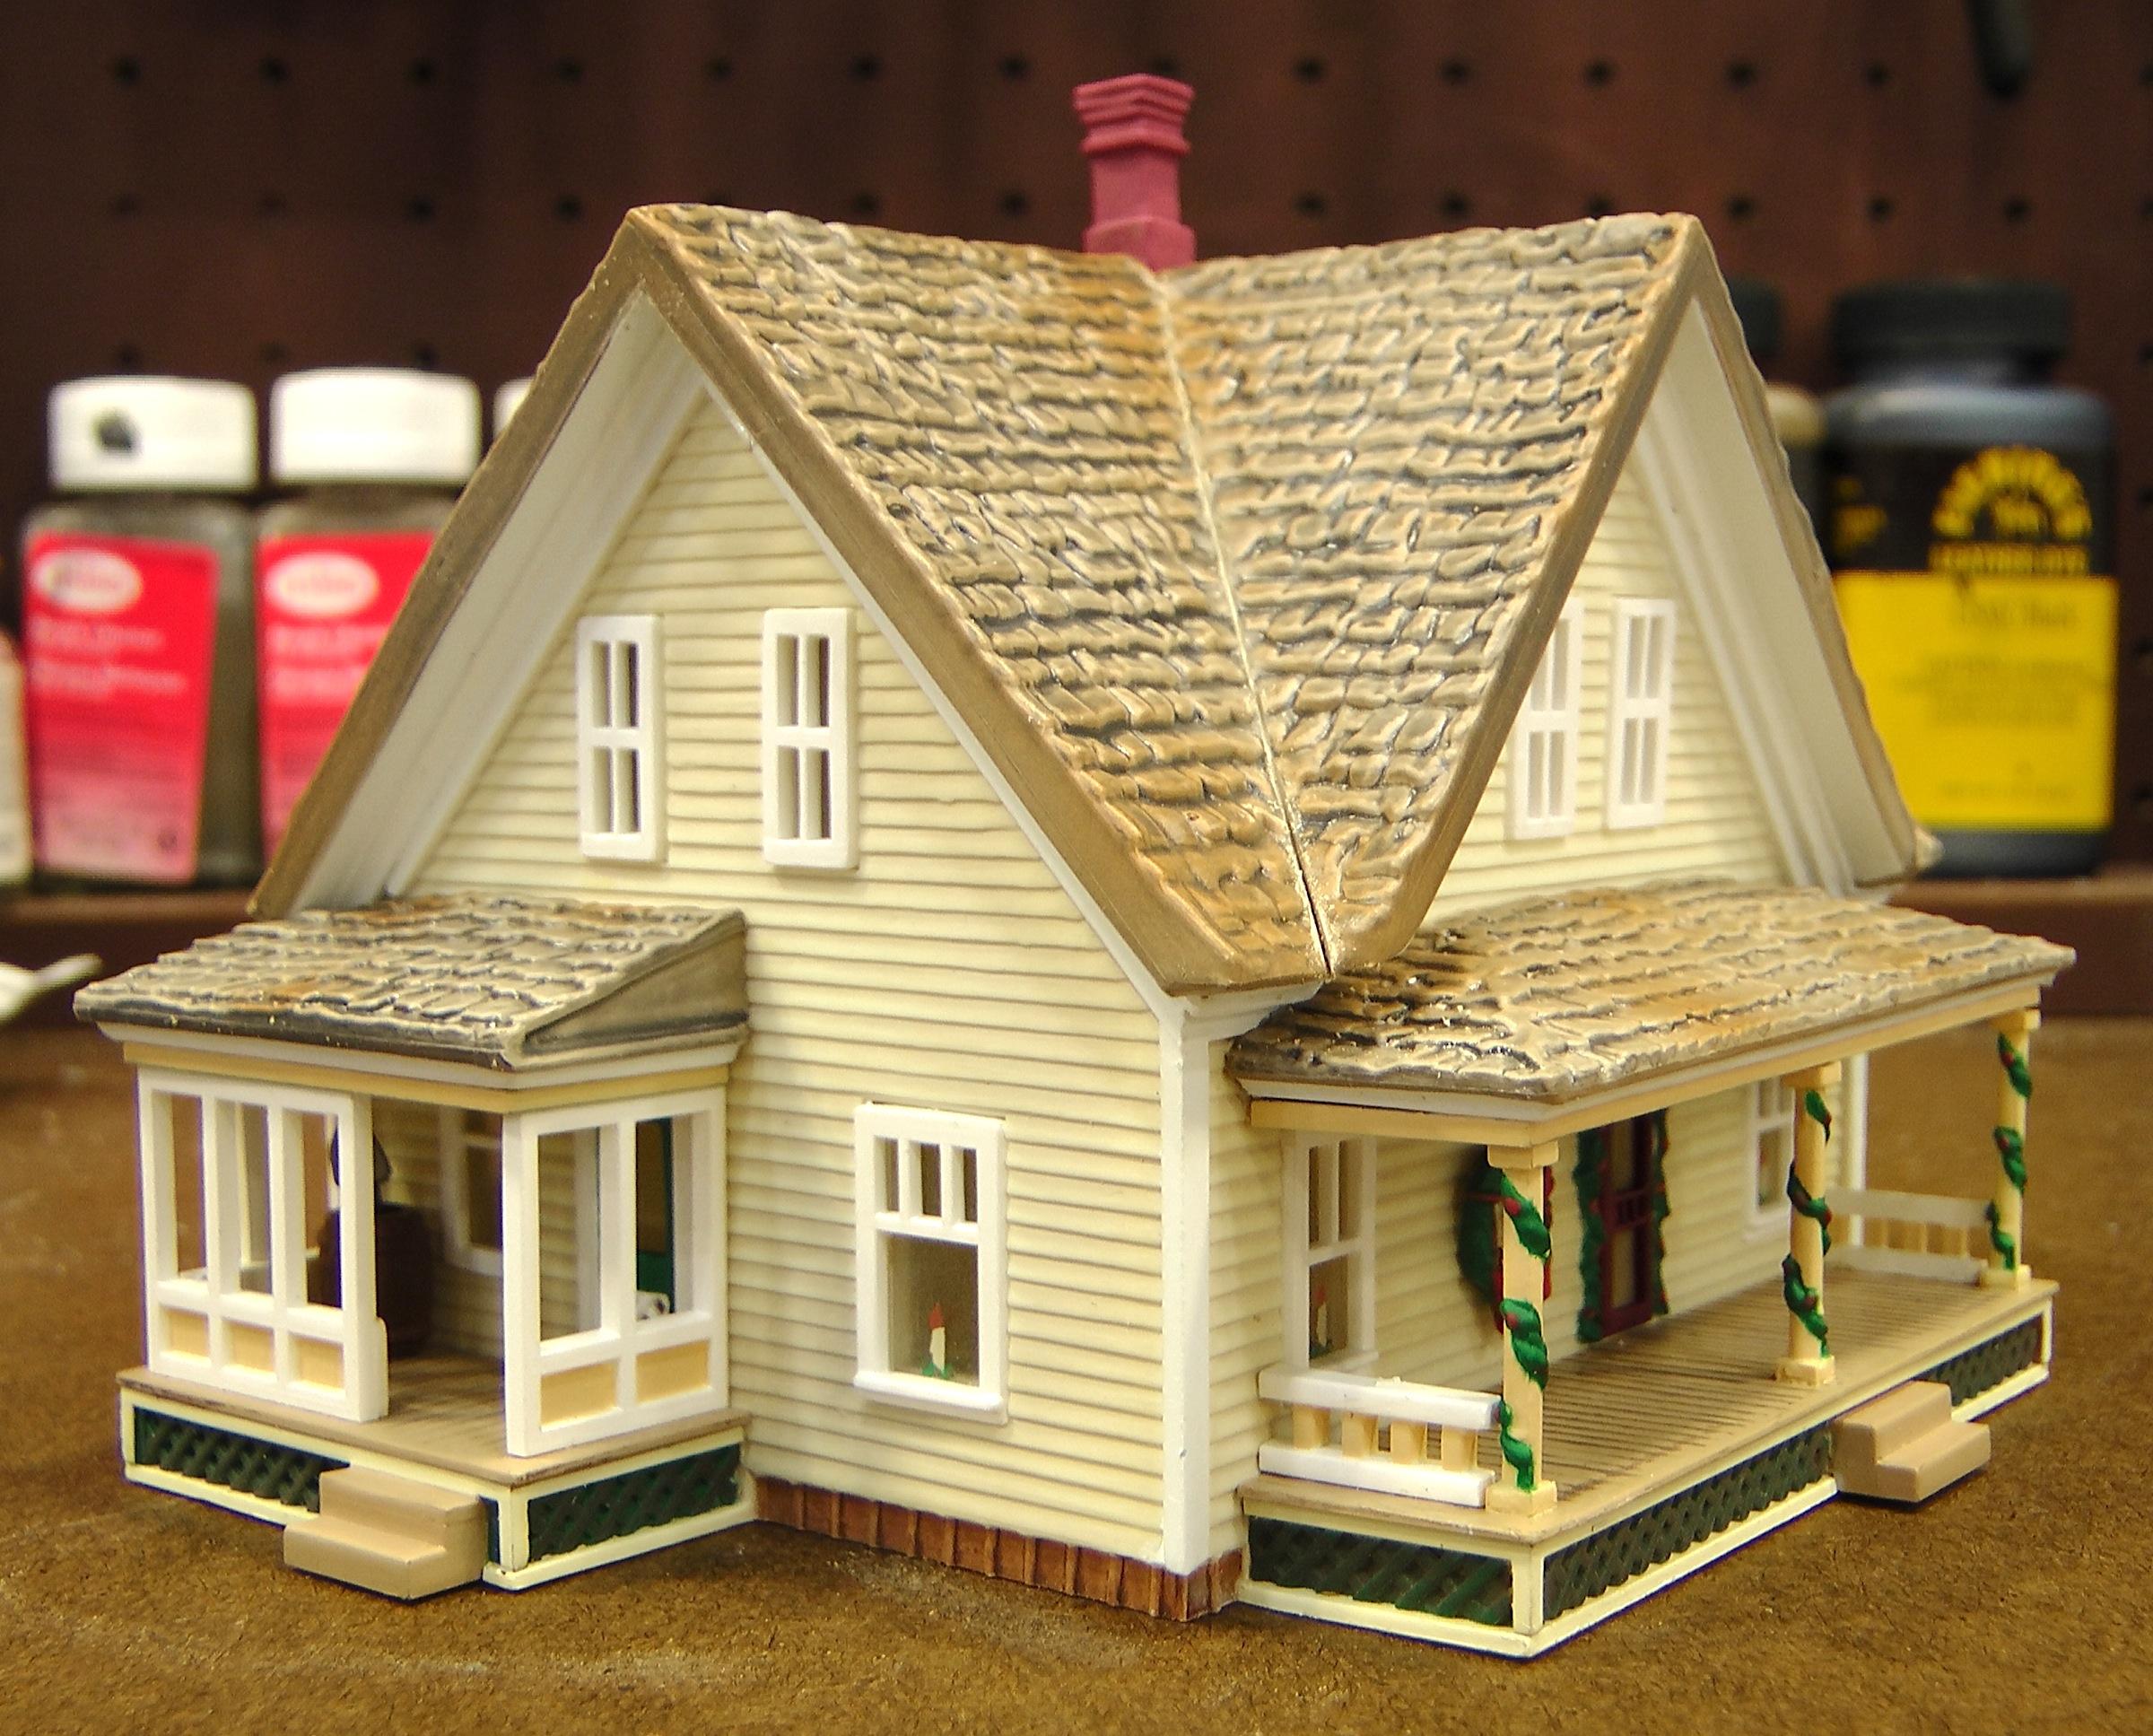 More ho half houses the denver durango silverton railroad for Building model houses